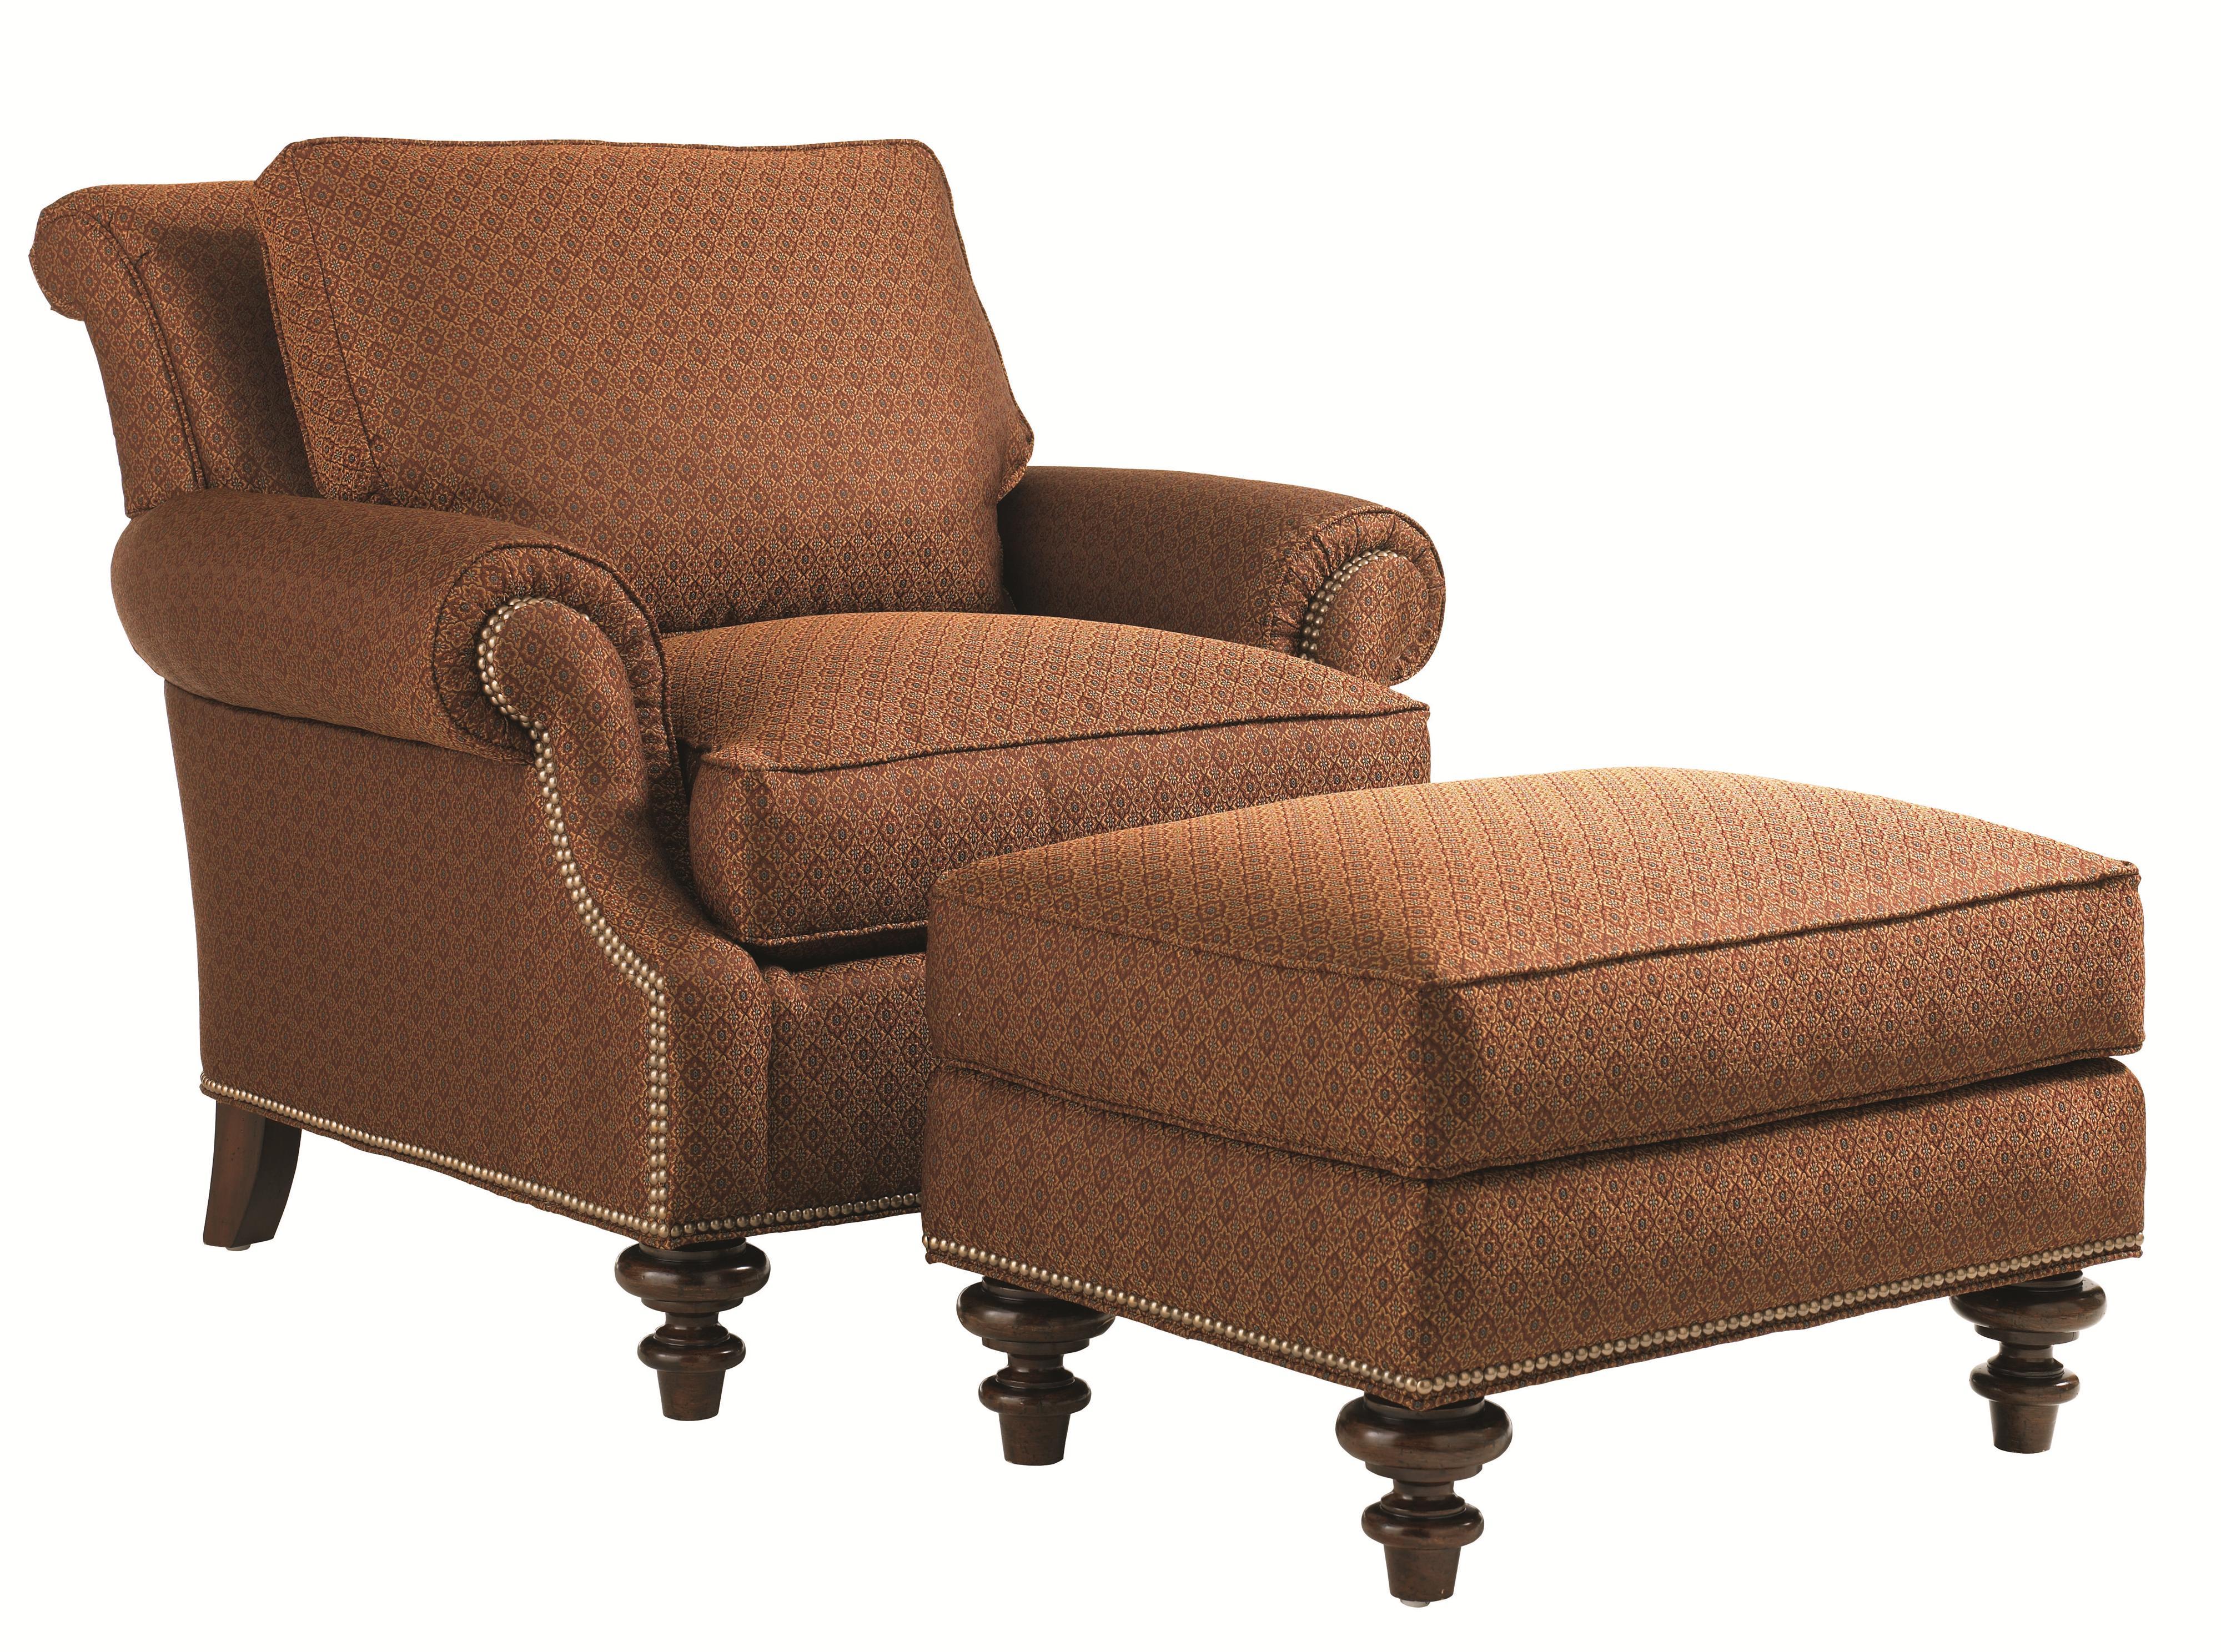 Lexington lexington upholstery 7871 11 darby chair and ottoman baer 39 s furniture chair Lexington home brands outdoor furniture